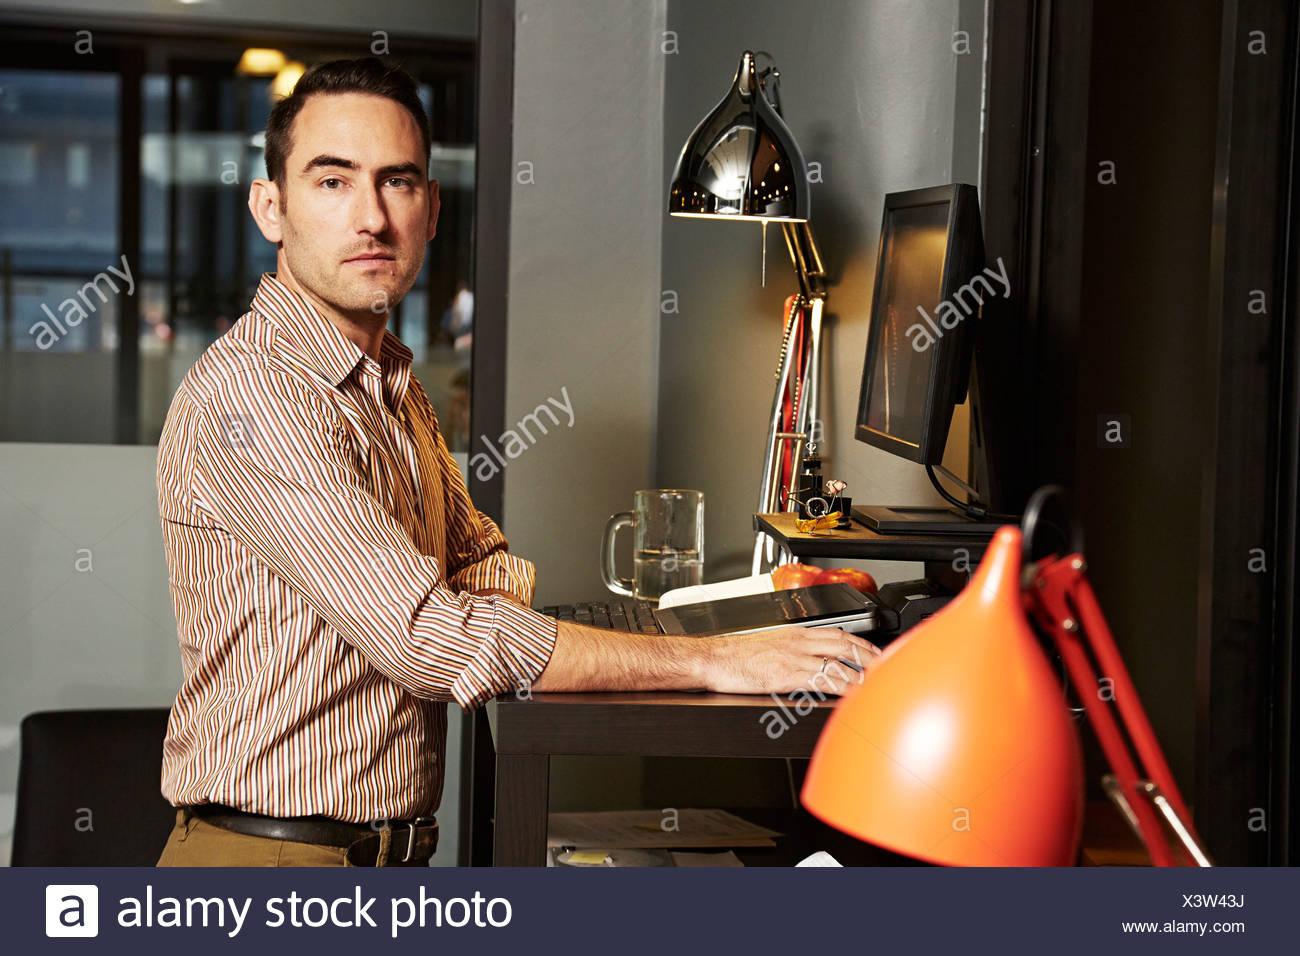 Porträt des Kaufmanns am Schreibtisch Stockbild